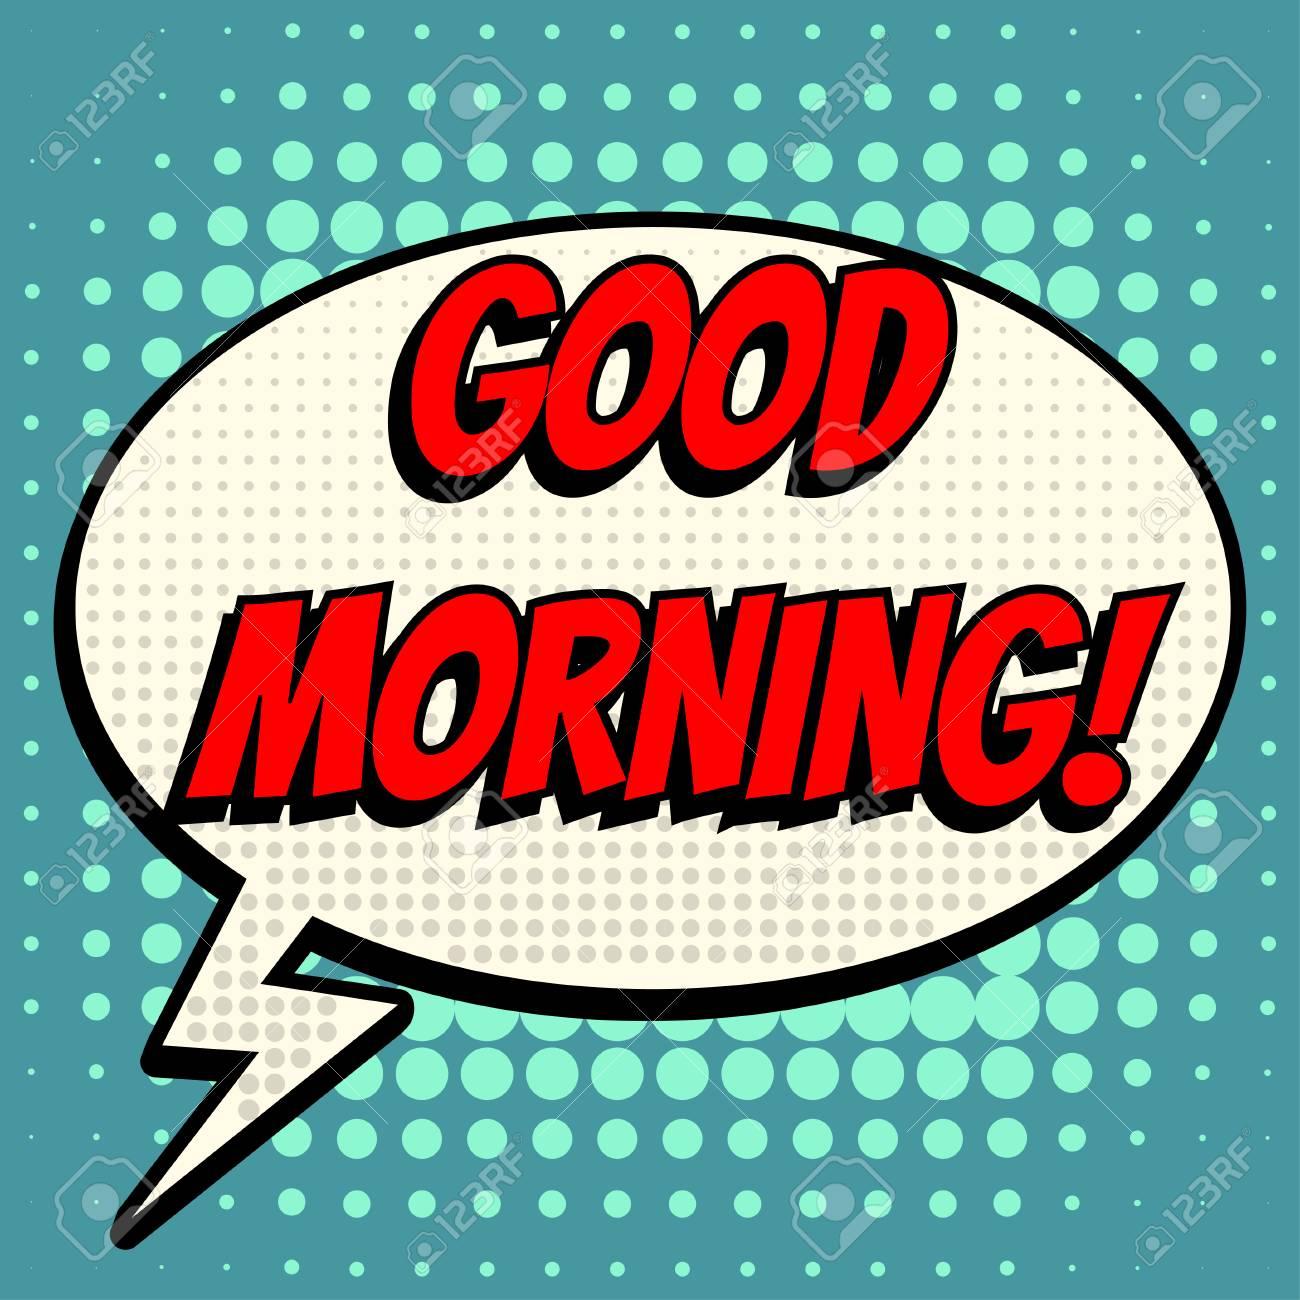 b631b7d397 Good morning comic book bubble text retro style Stock Vector - 58666329